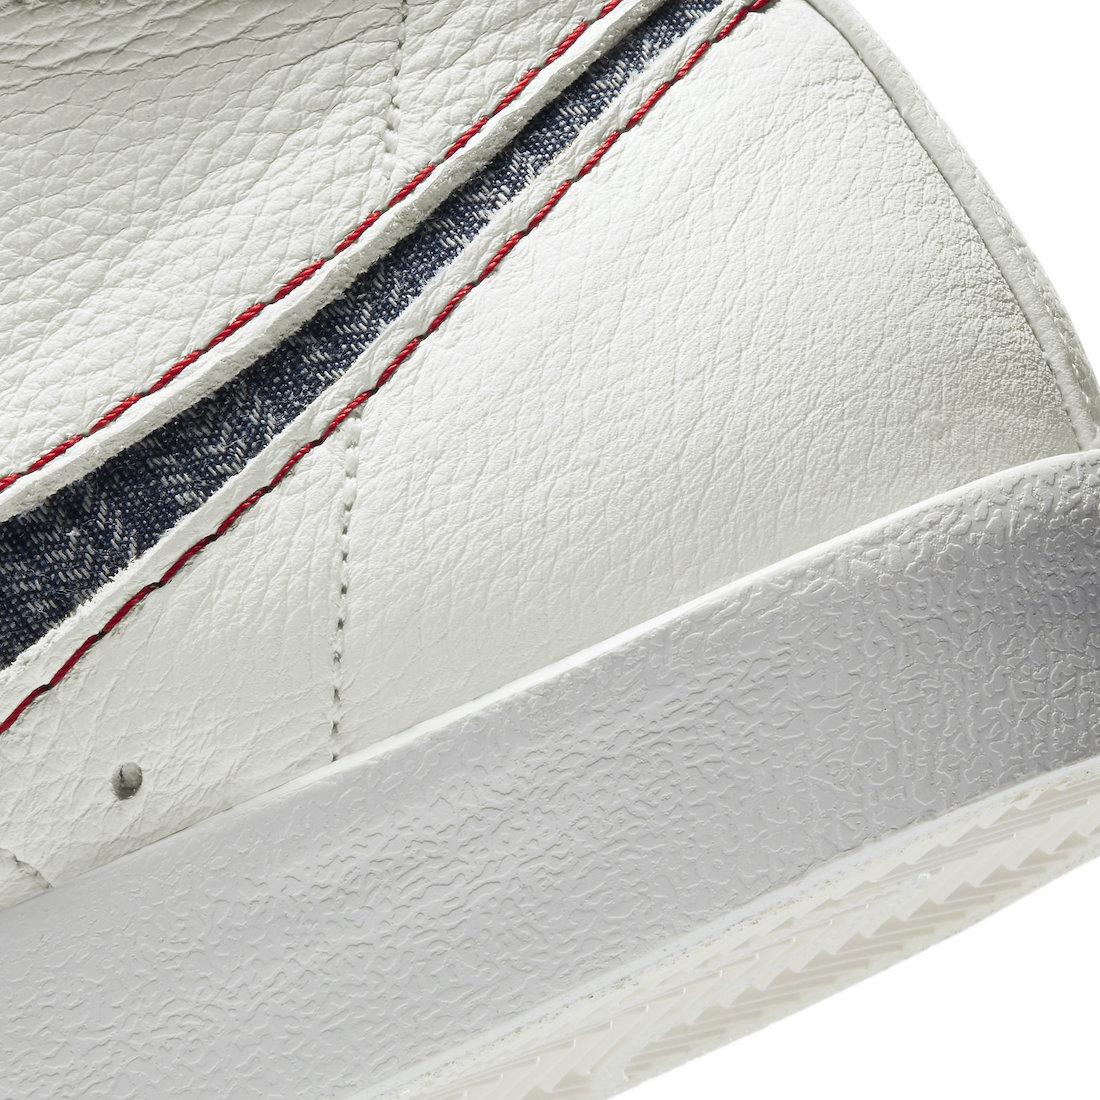 Swoosh, Summit White, Nike Blazer Mid, Midnight Navy, Blazer Mid, Blazer, Air Max 95, Air Max 90, Air Max 1, Air Max